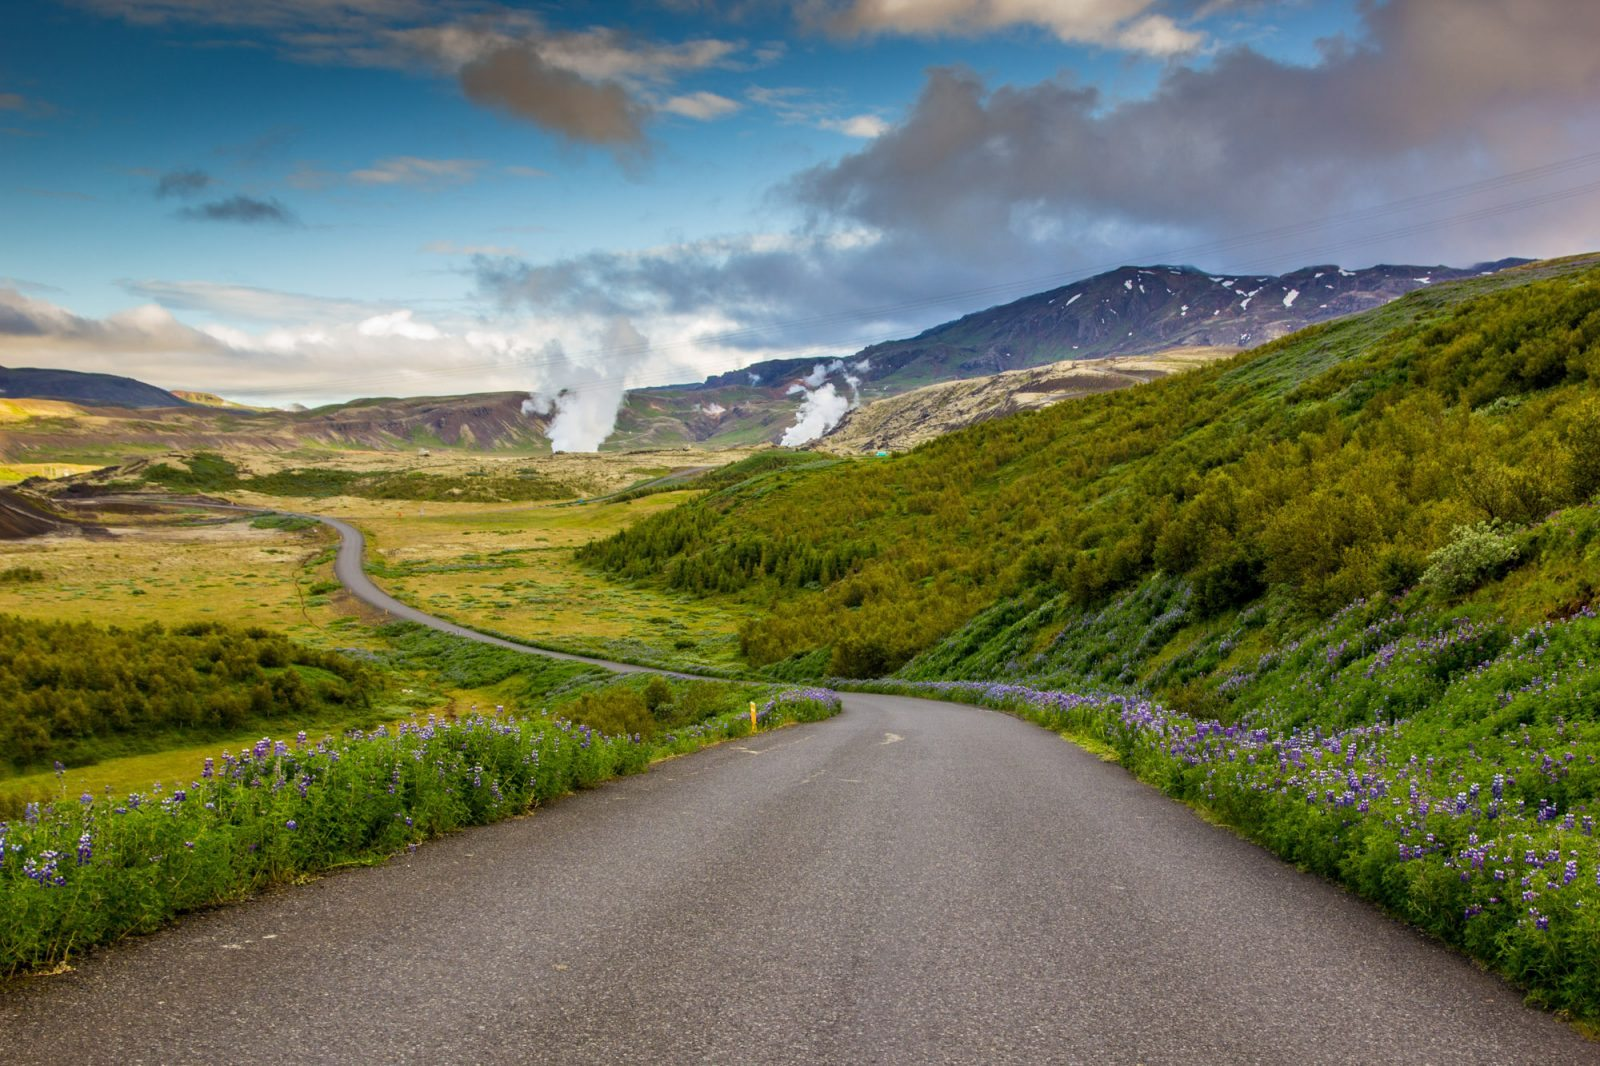 Road to Thingvellir national park Iceland